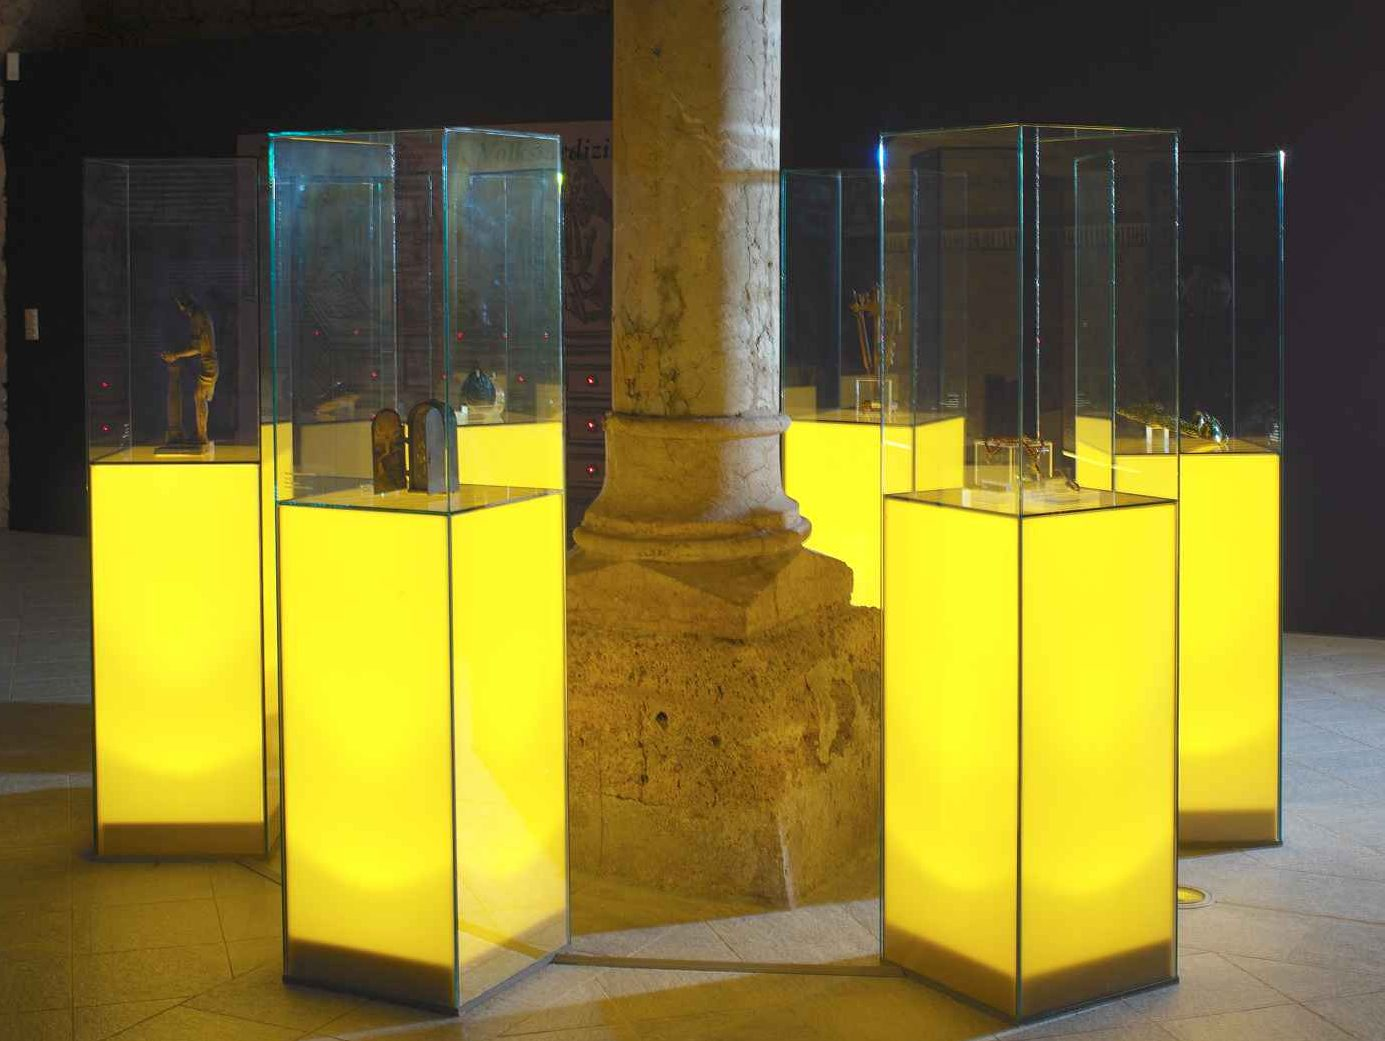 Kirche - sechs beleuchtete Vitrinen mit sakralen Objekten